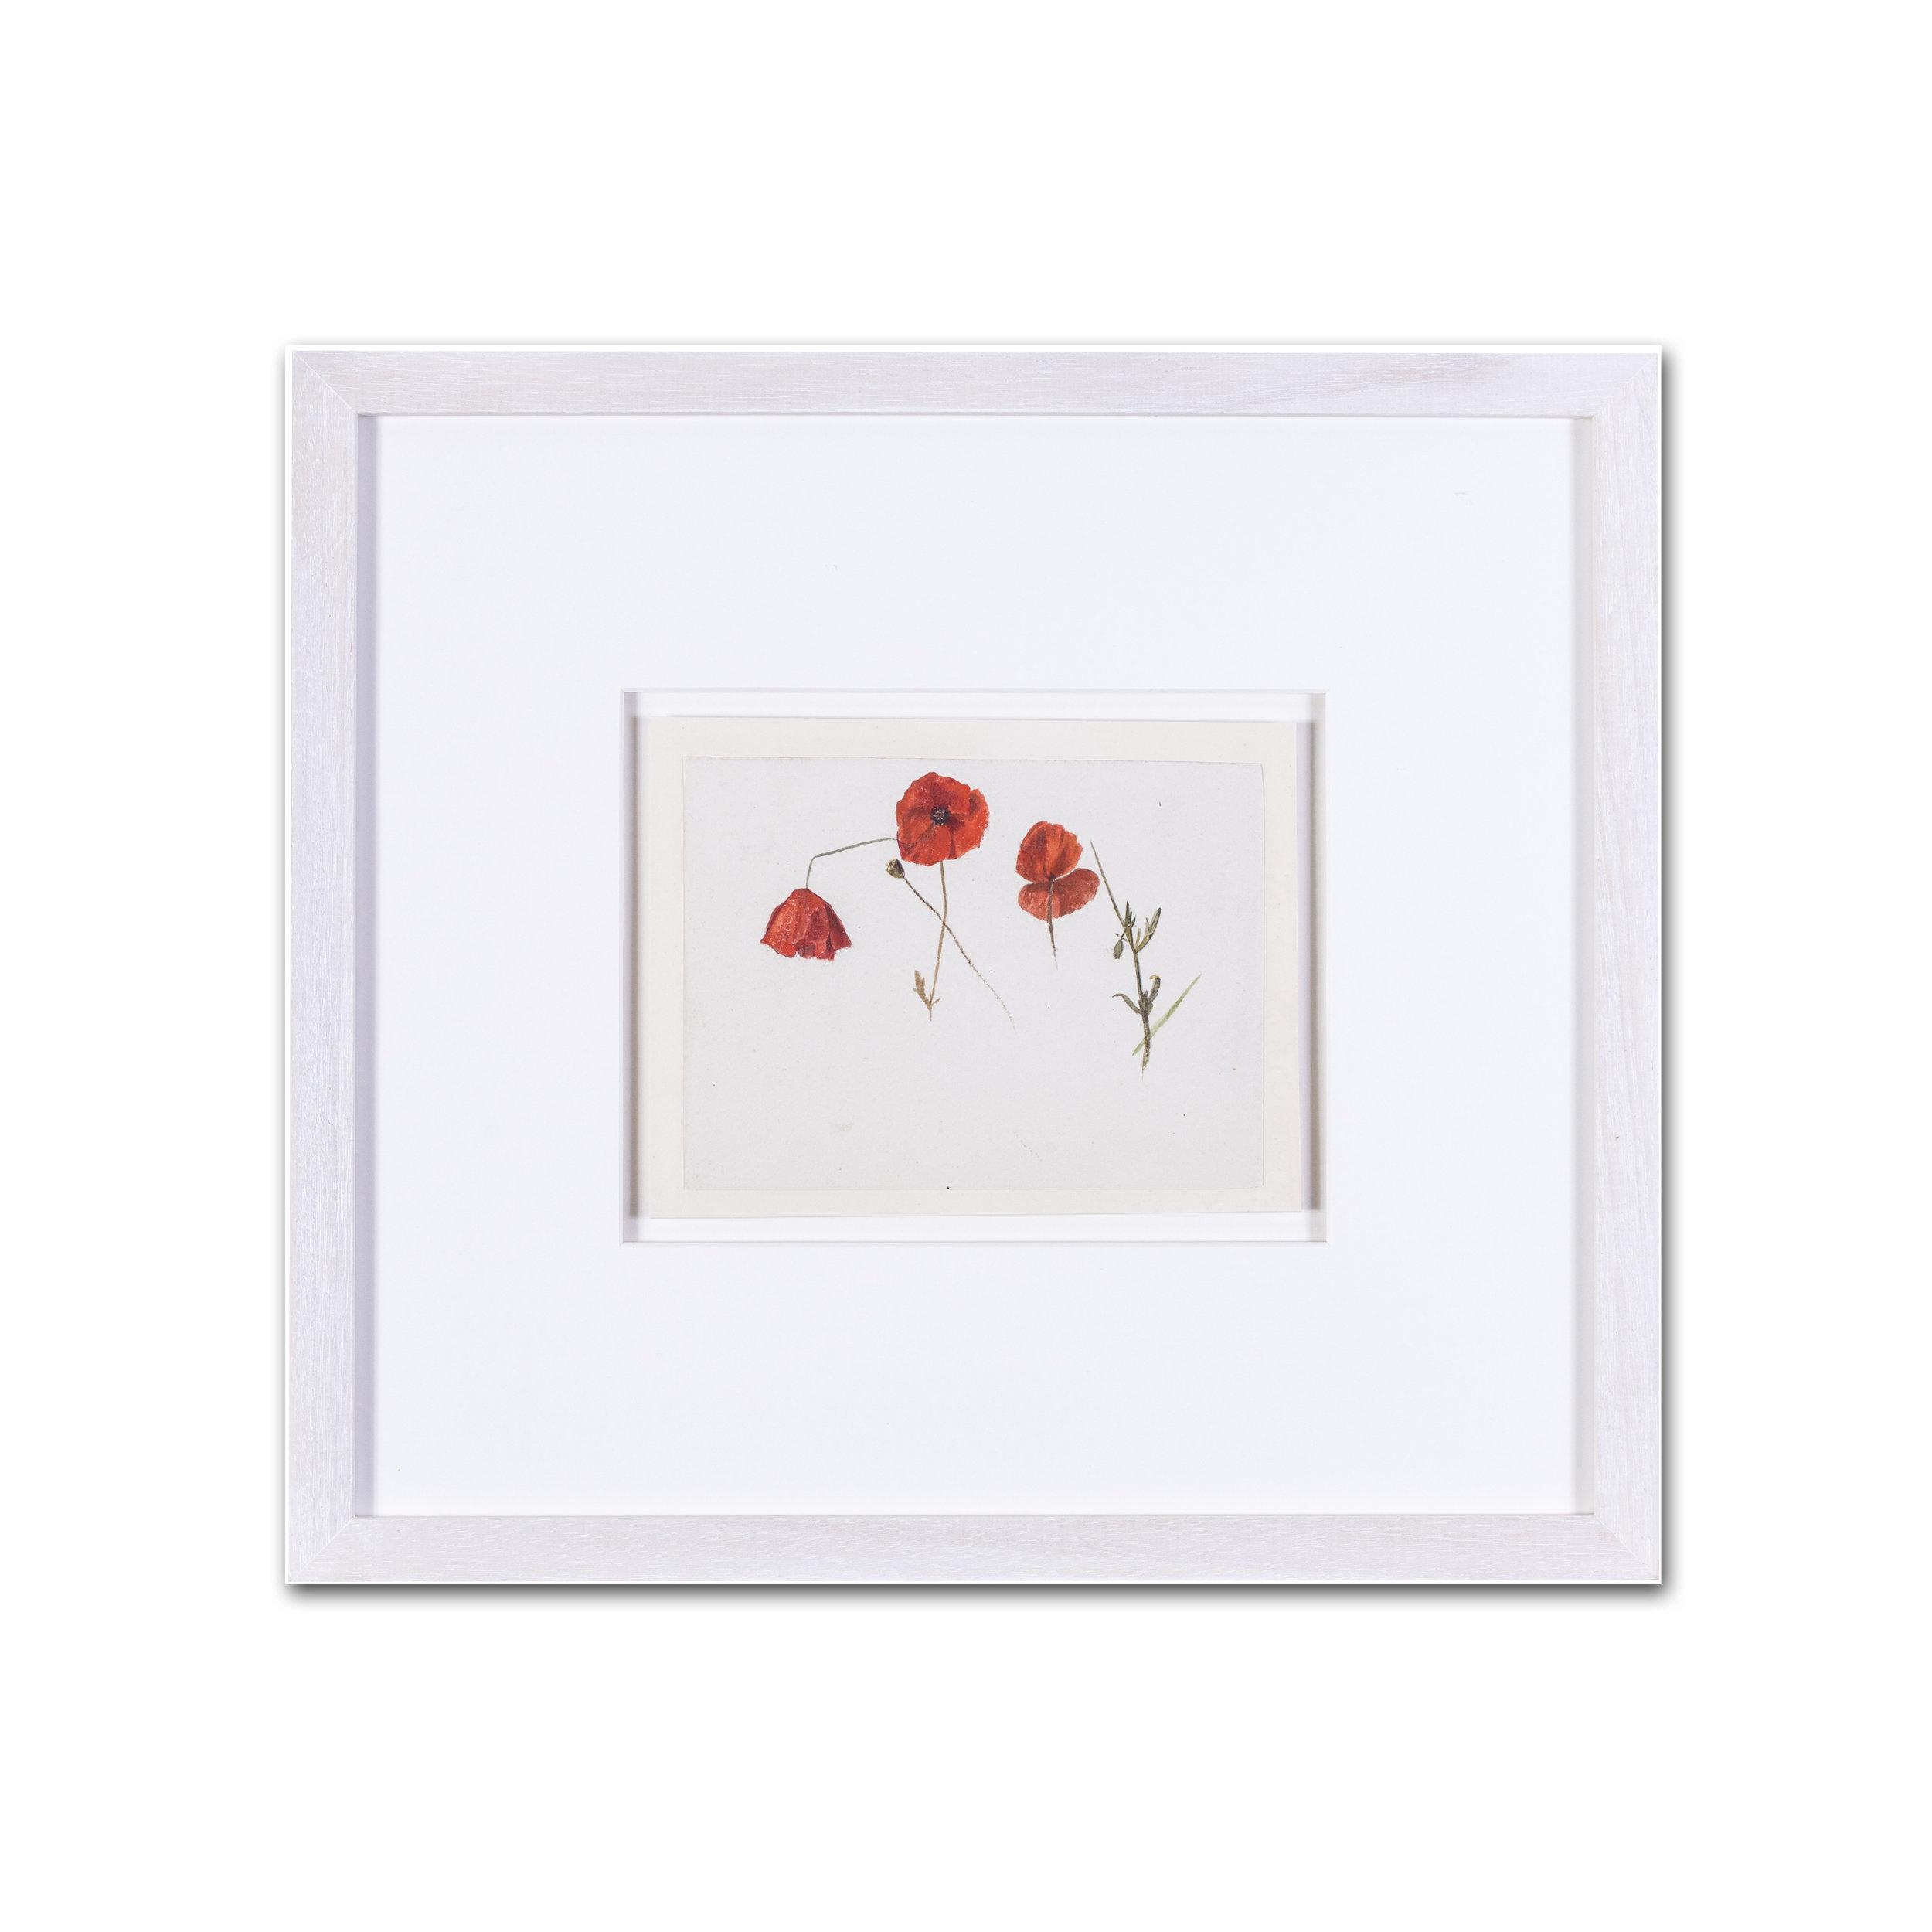 Evelyn de Morgan  Poppies  Price: £900